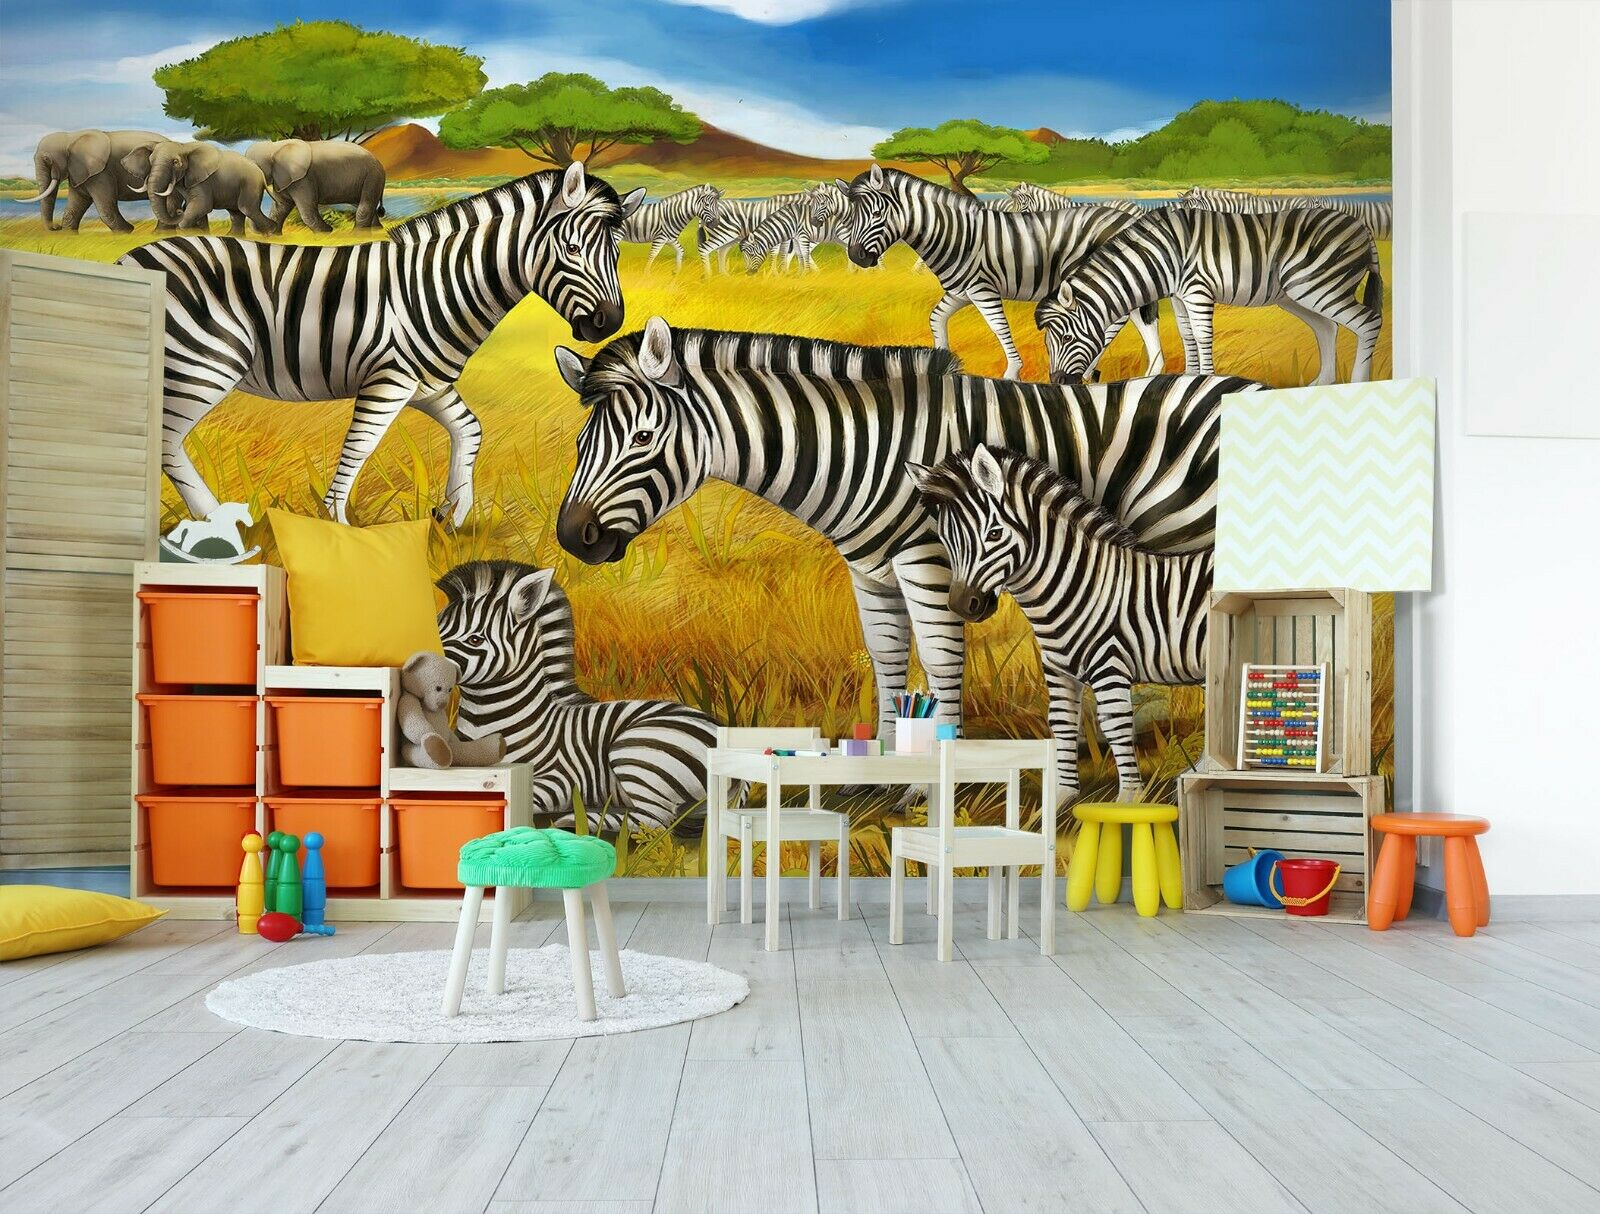 3D Zebra Elephant R303 Business WandPapier Wand Mural Self-adhesive Commerce An